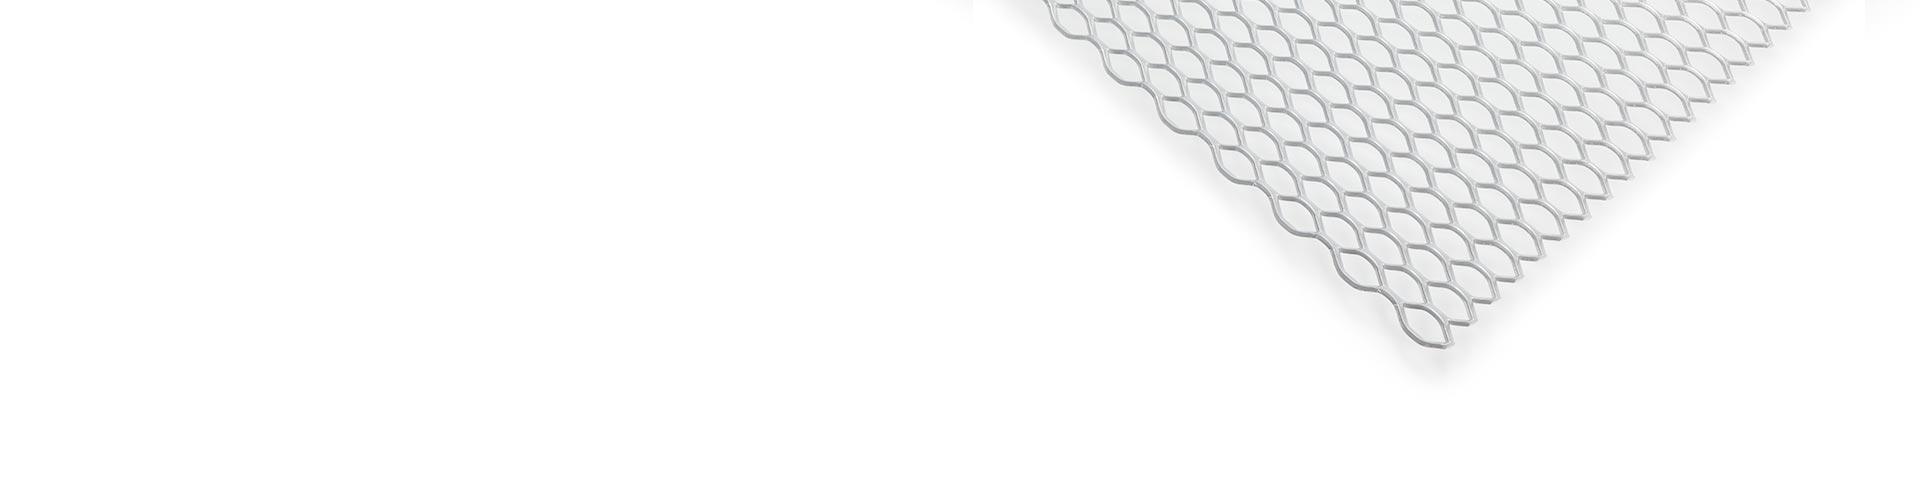 Streckmetall mit Sechskantlöchern – perfolinea.de